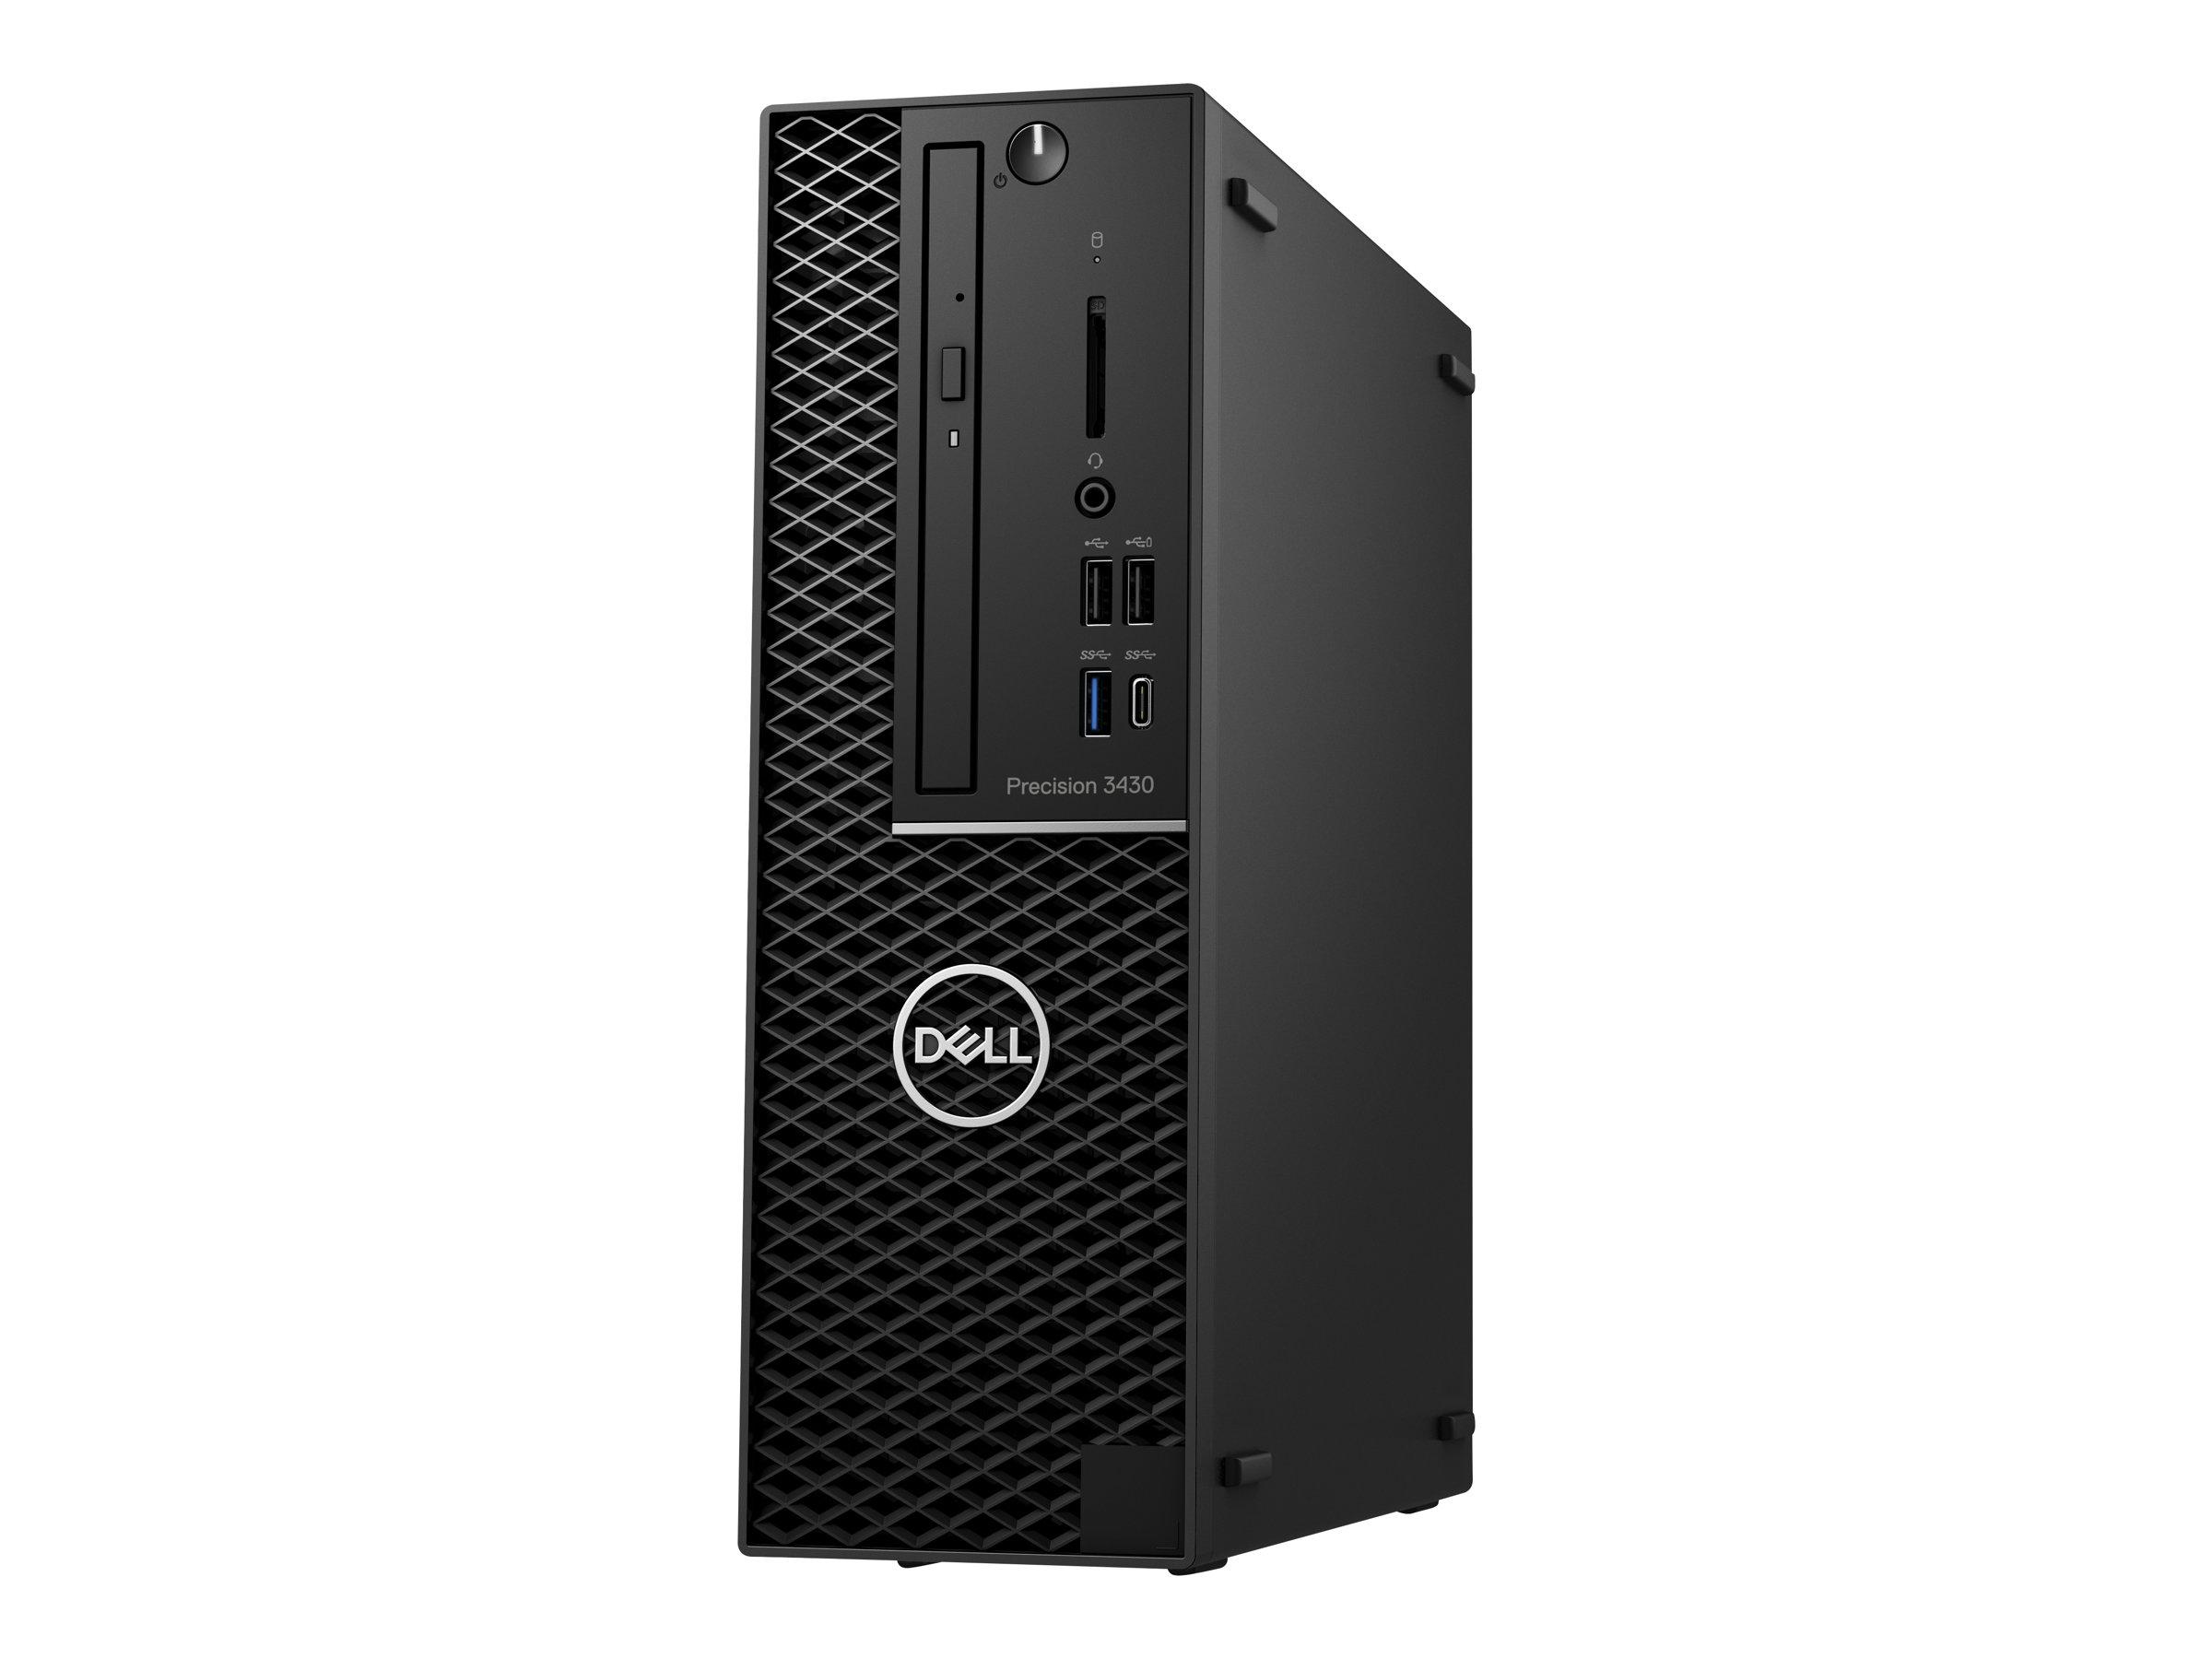 Dell Precision 3430 Small Form Factor - SFF - 1 x Core i7 8700 / 3.2 GHz - RAM 8 GB - SSD 256 GB - DVD-Writer